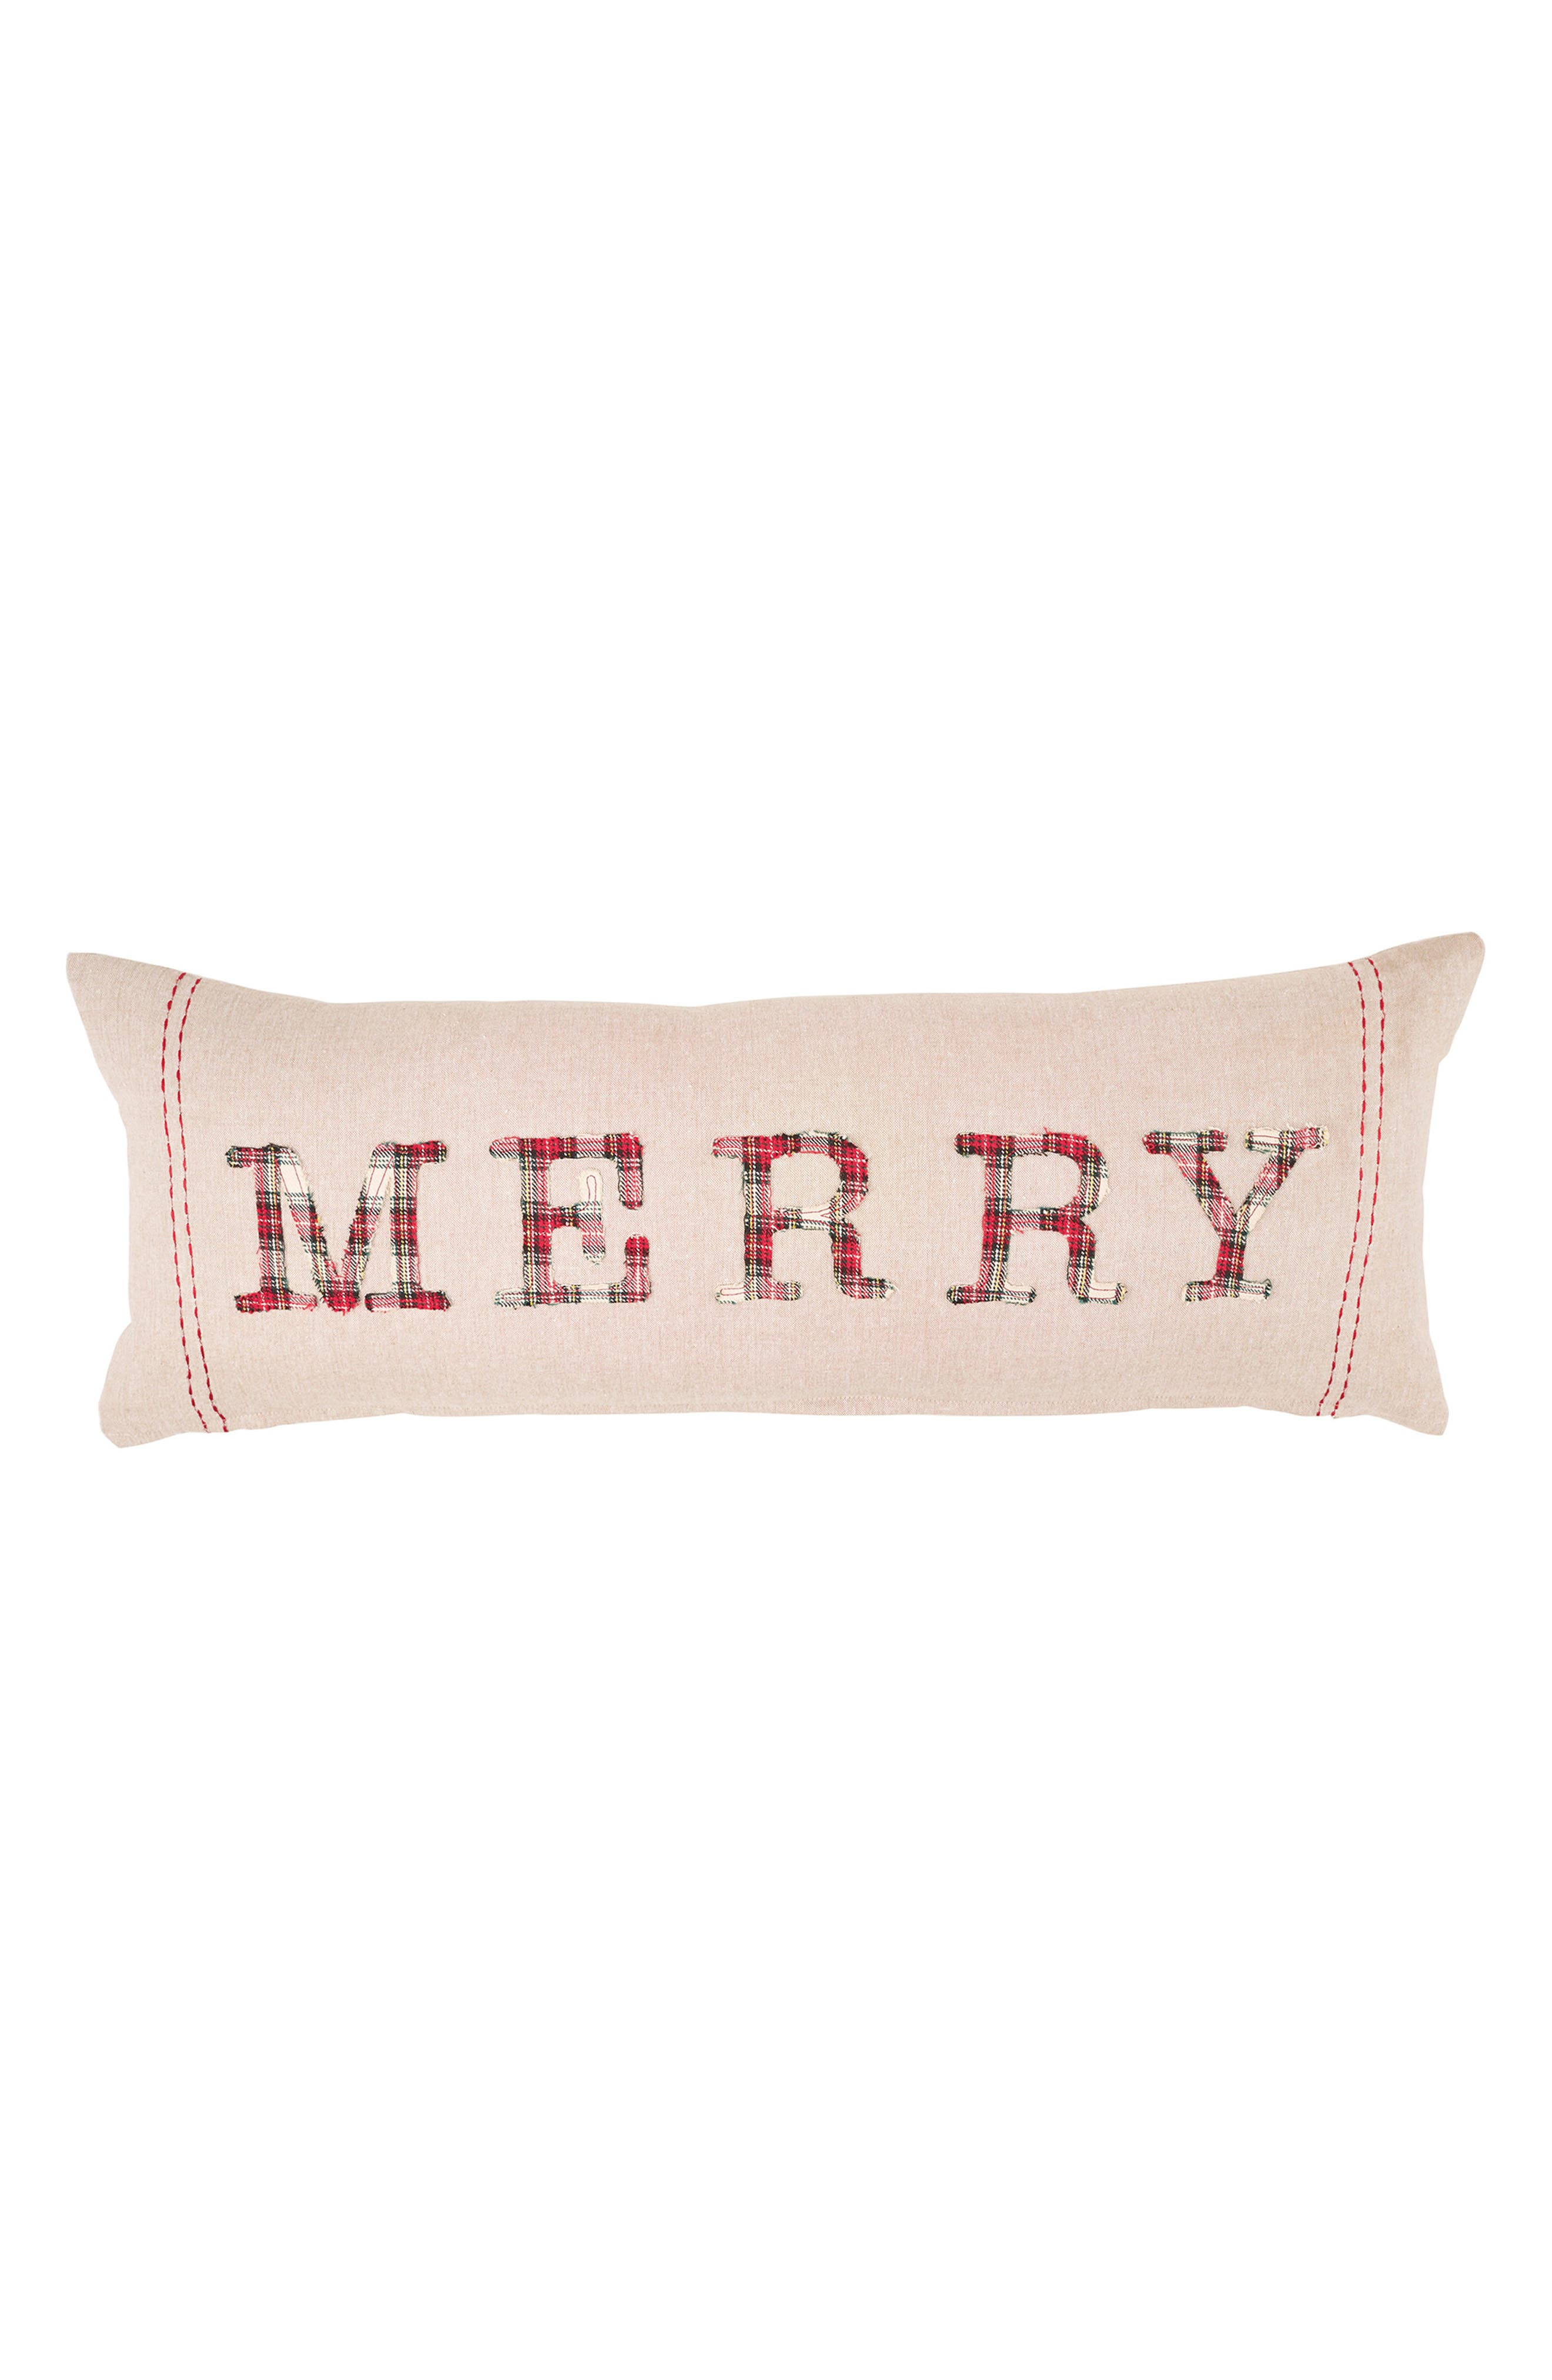 Main Image - Mud Pie Merry Tartan Appliqué Accent Pillow